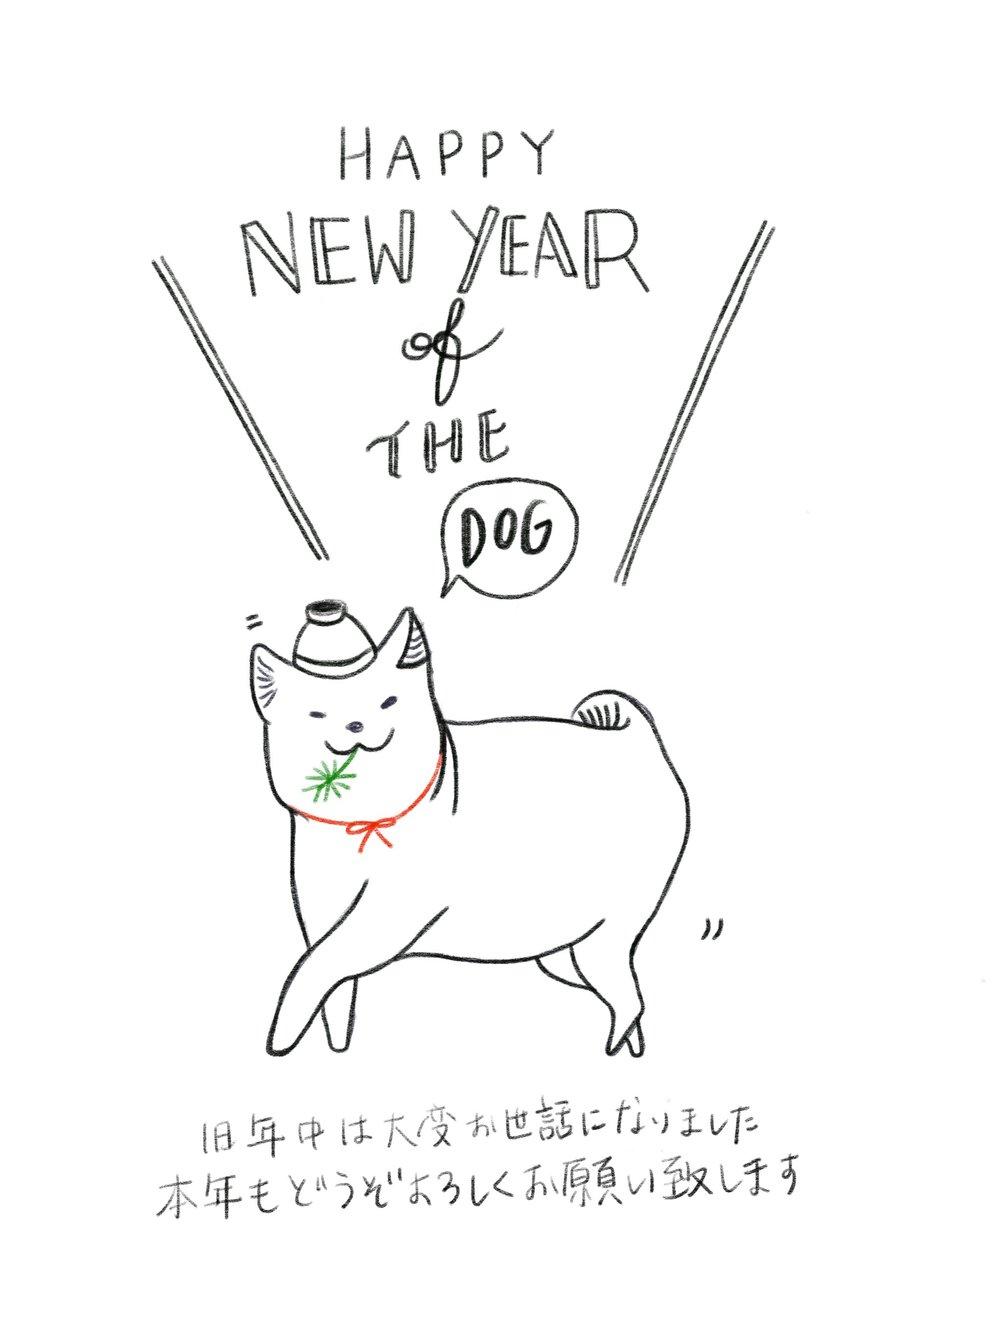 2018-dog.JPG